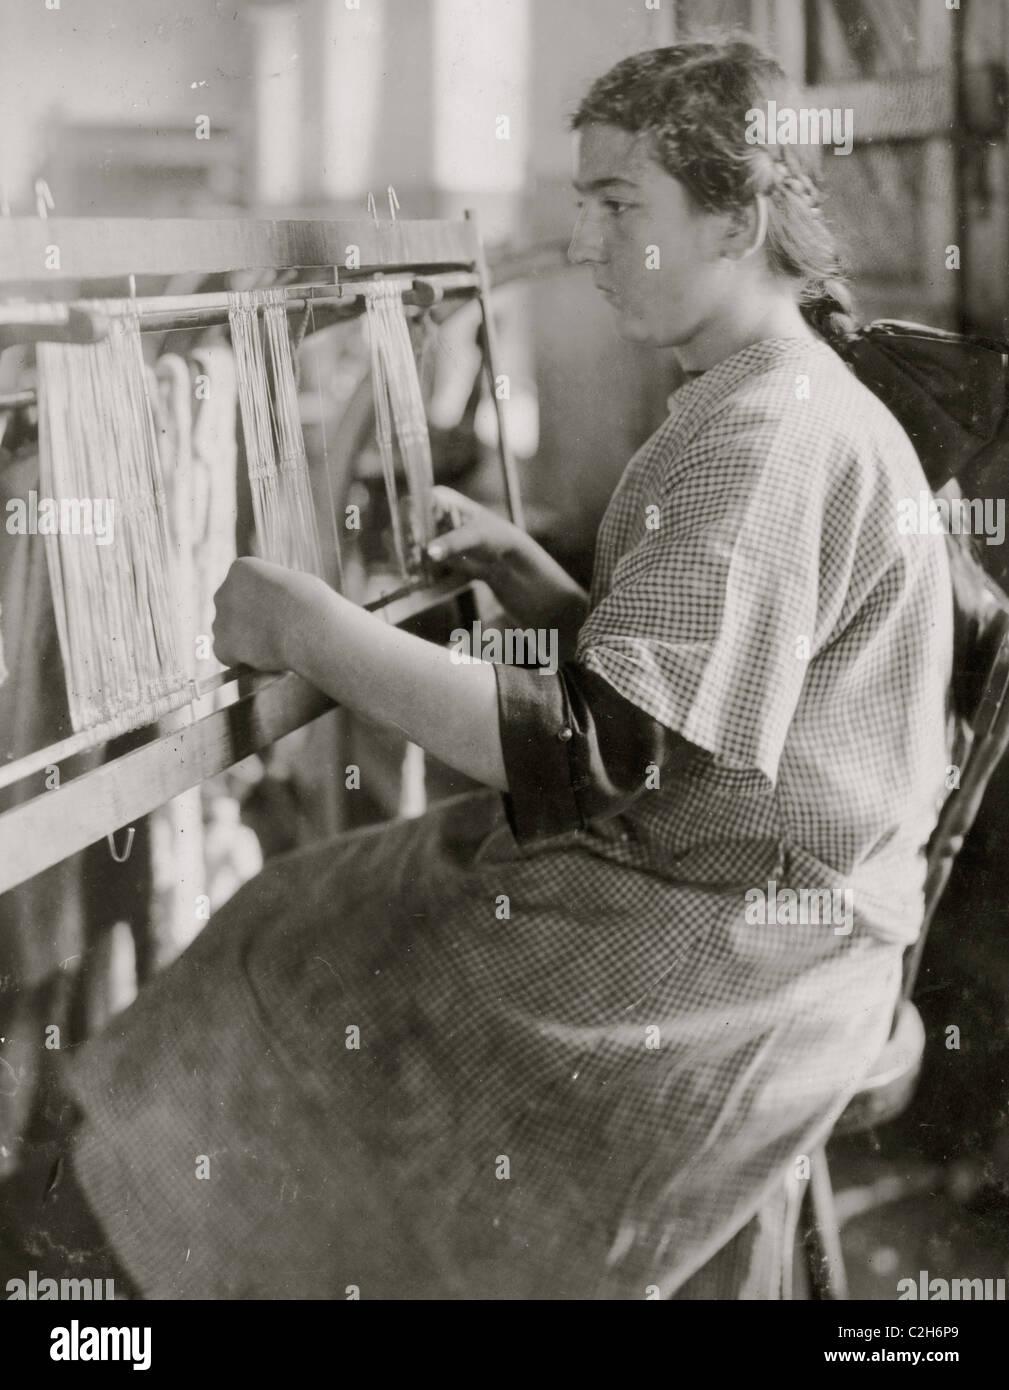 Harness Maker Stockfotos & Harness Maker Bilder - Alamy